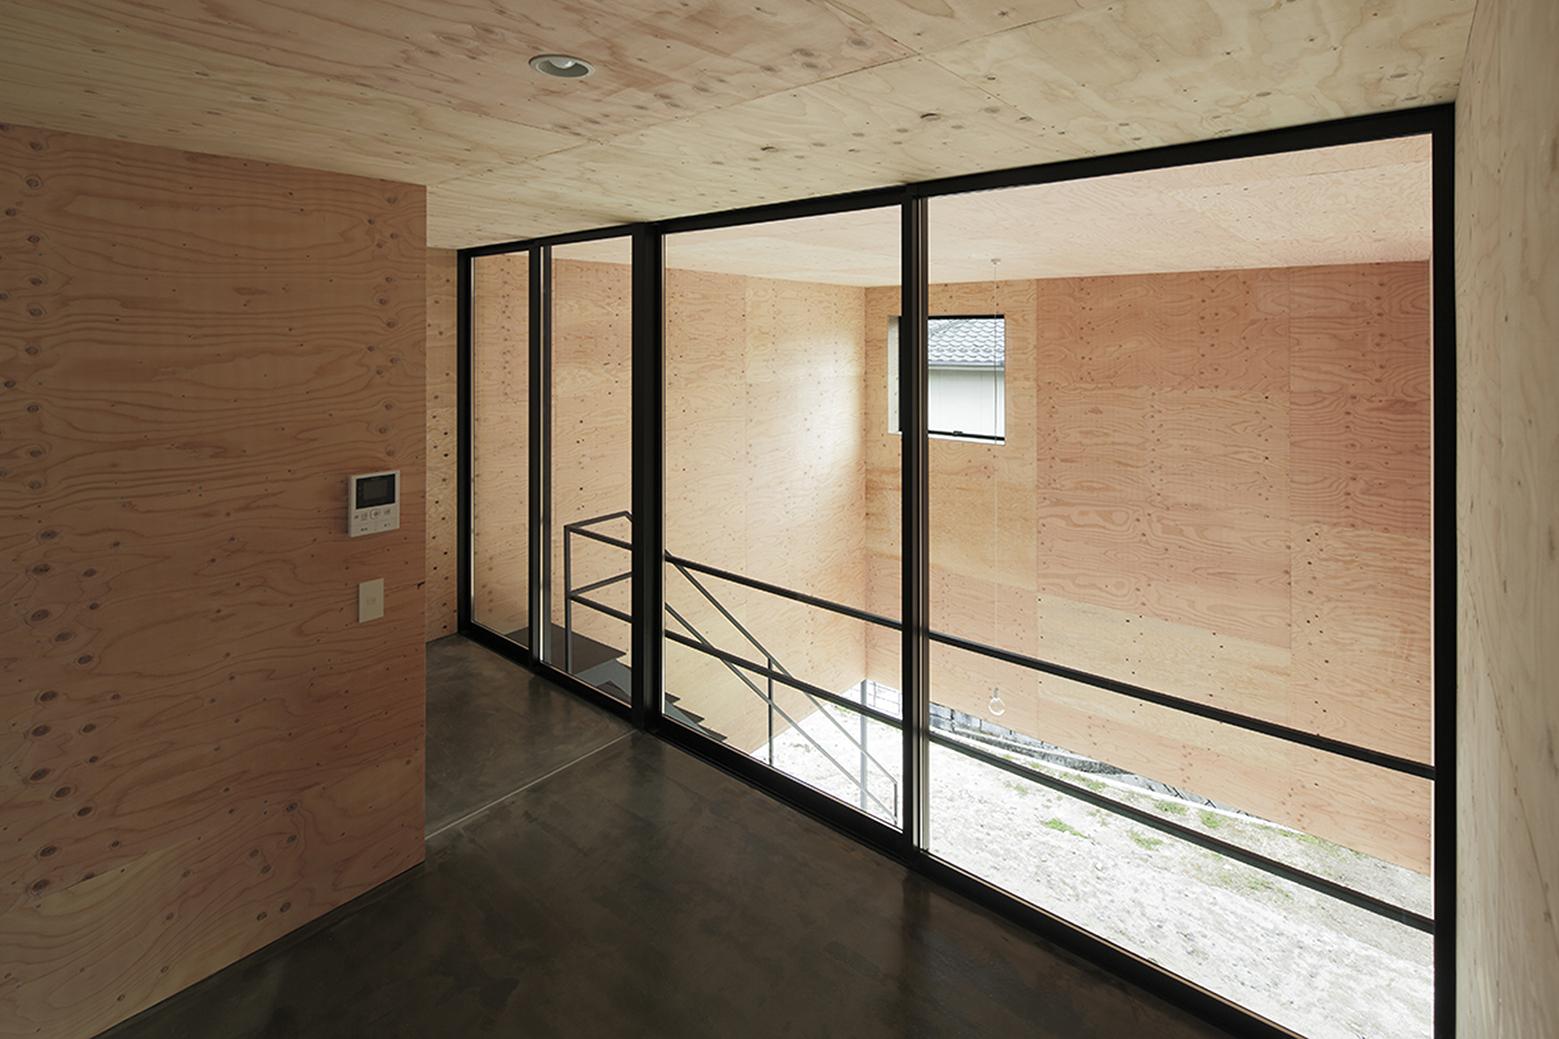 540ea1b6c07a802ff5000176_house-in-miyake-hidetaka-nakahara-architects-yoshio-ohno-architects_oono_miyake_140407_051